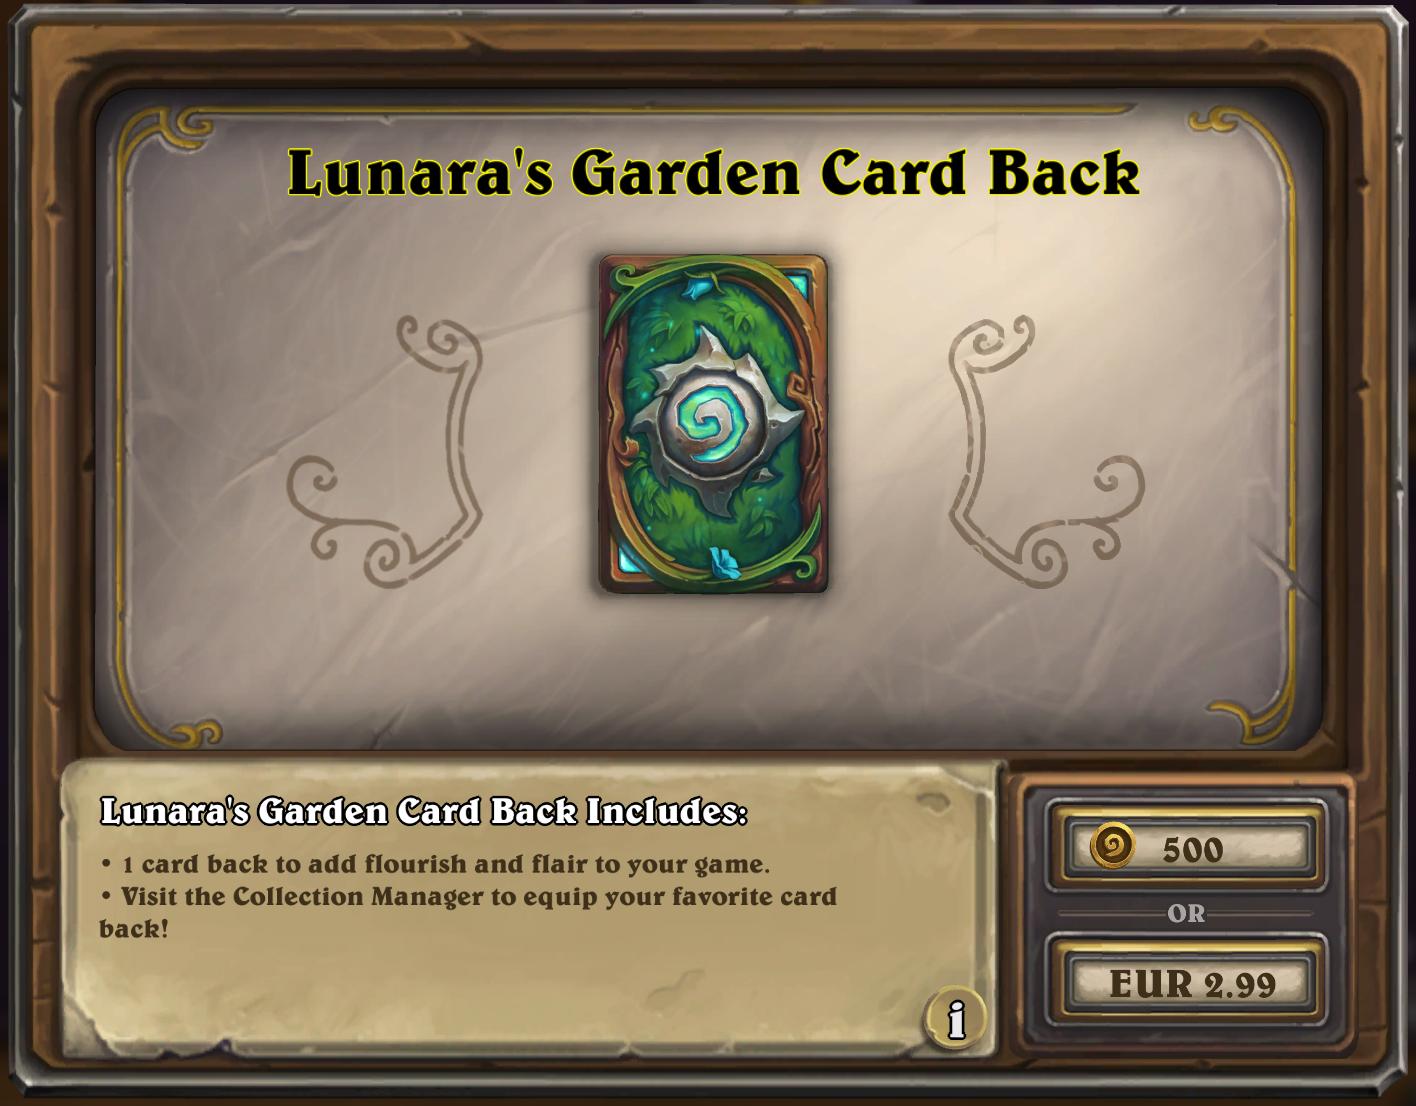 Lunara's Card Back